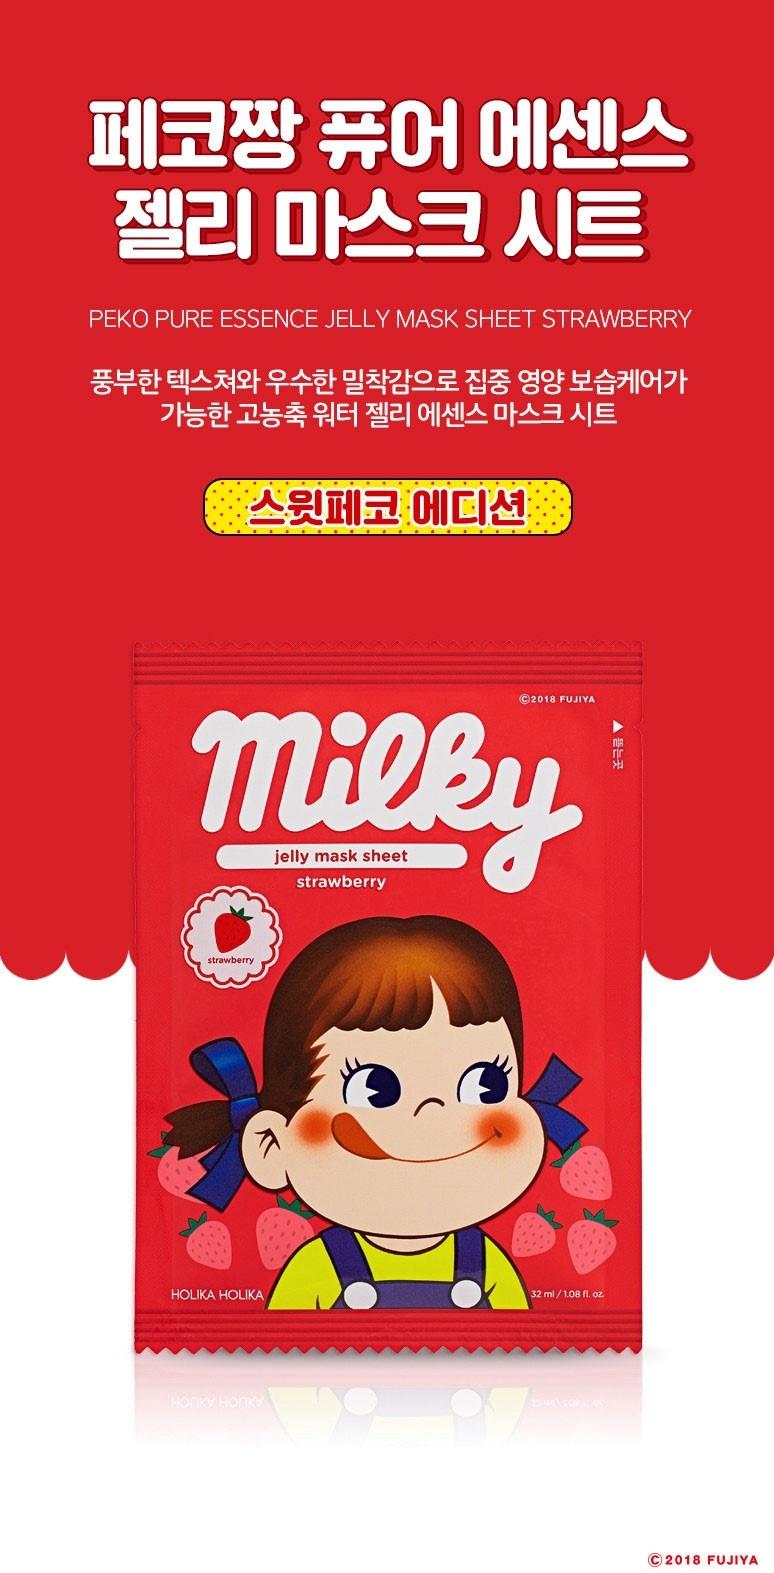 Jelly Mask Sheet Strawberry (Sweet Peko Limited Edition)-2